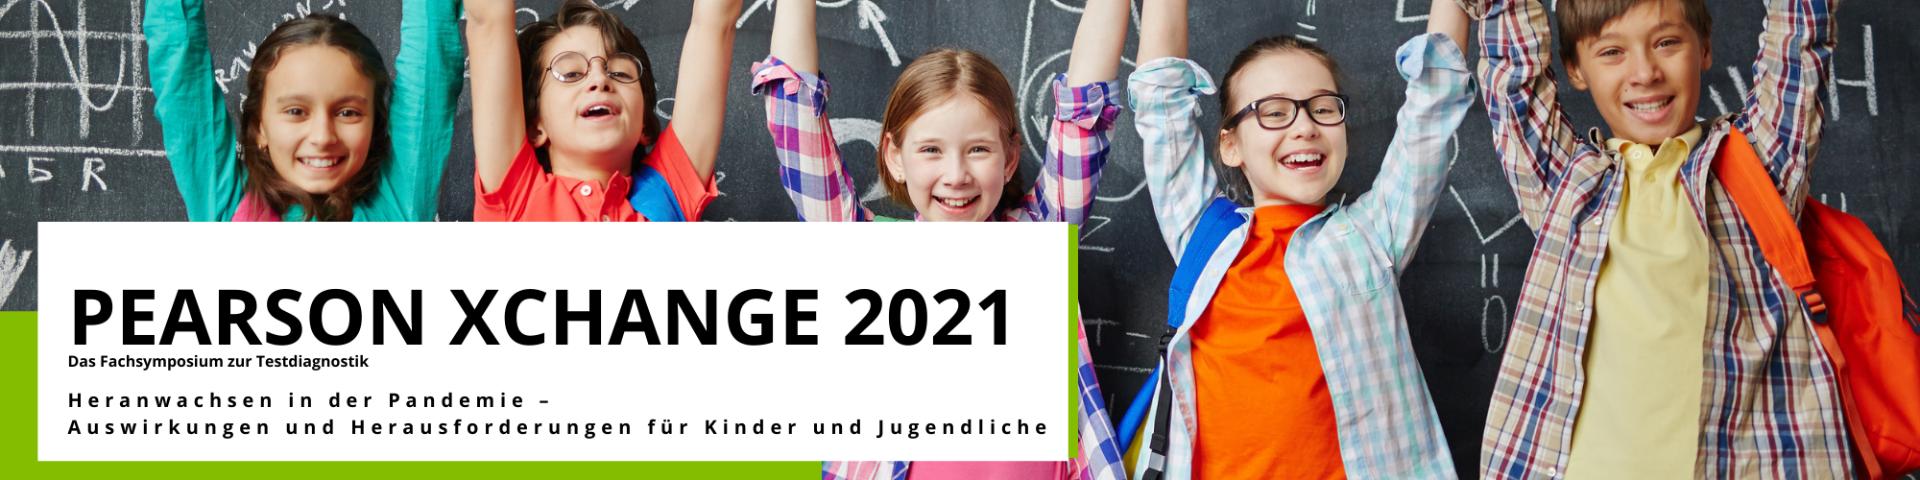 Pearson Xchange 2021